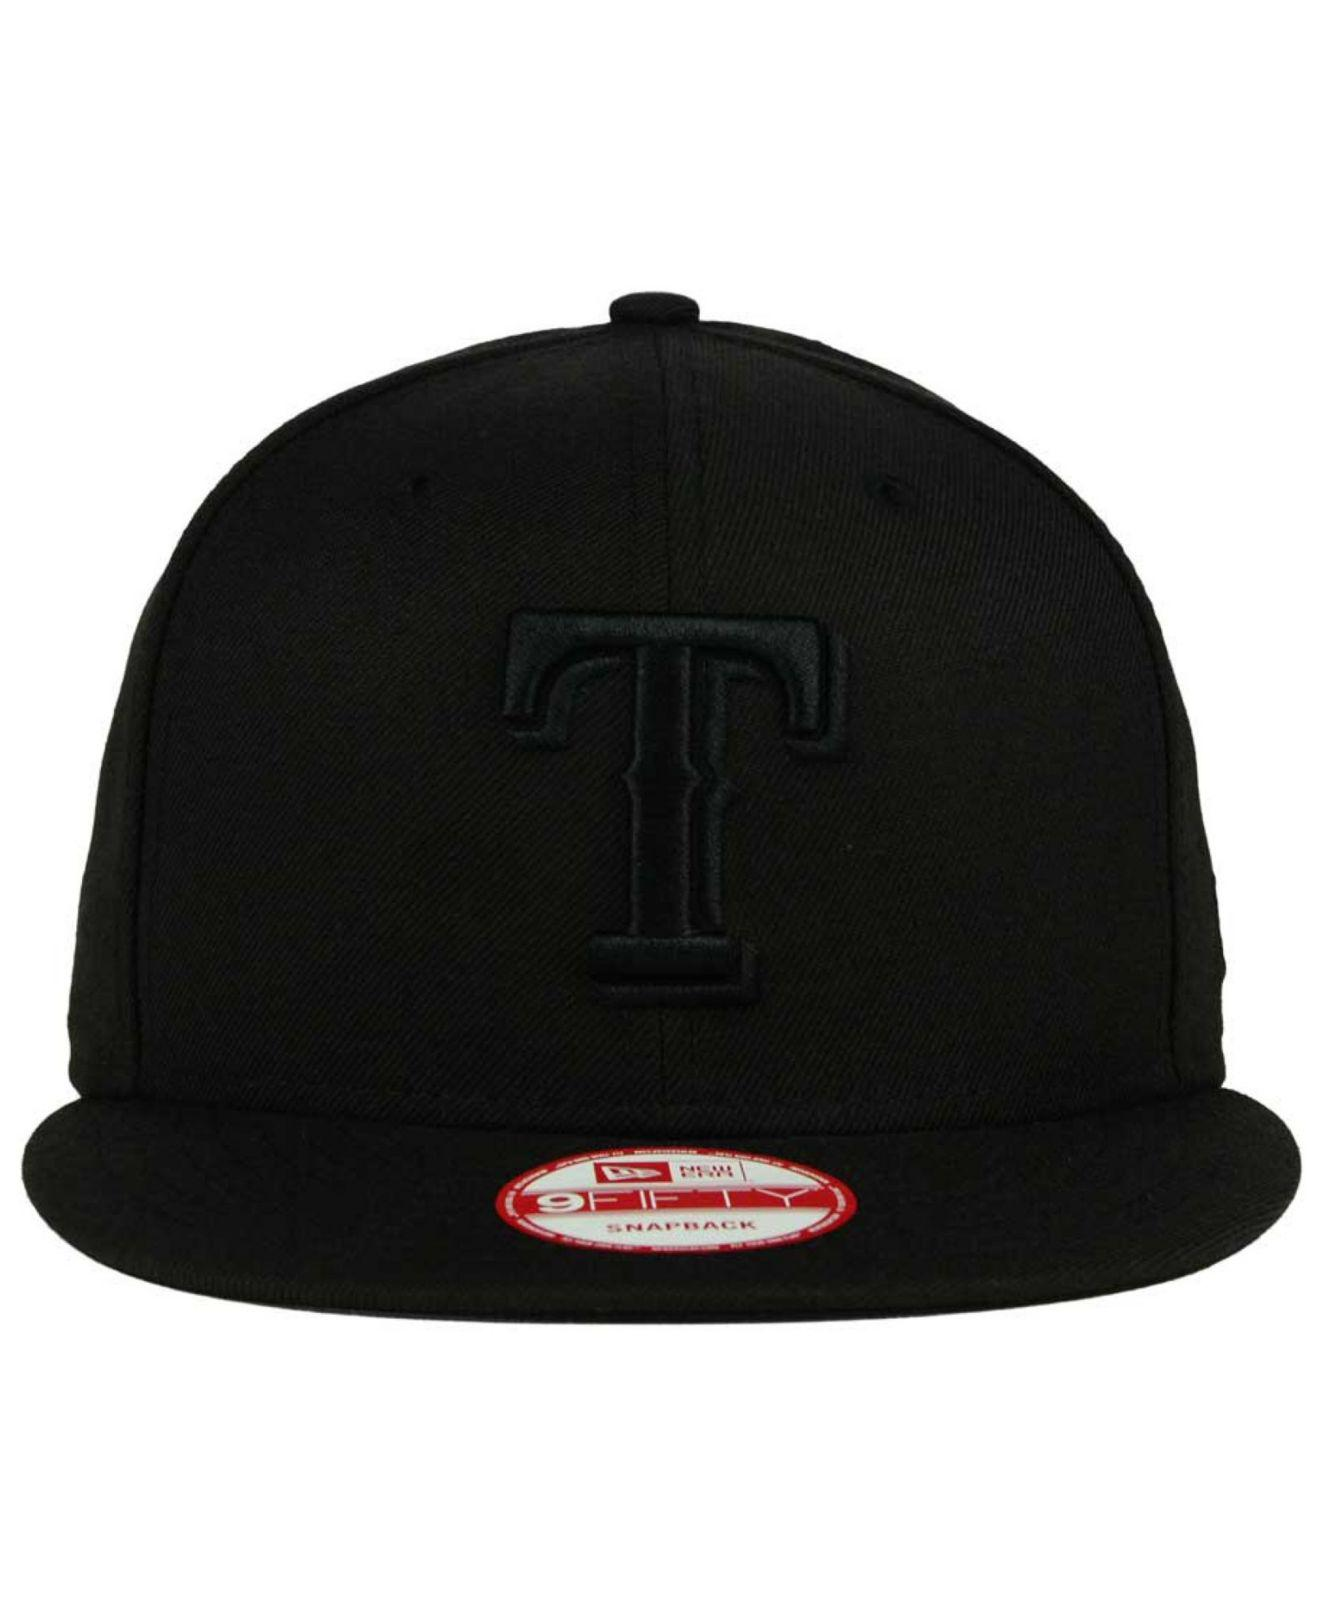 best service 3201d dd17f KTZ Texas Rangers Black On Black 9fifty Snapback Cap in Black for Men - Lyst